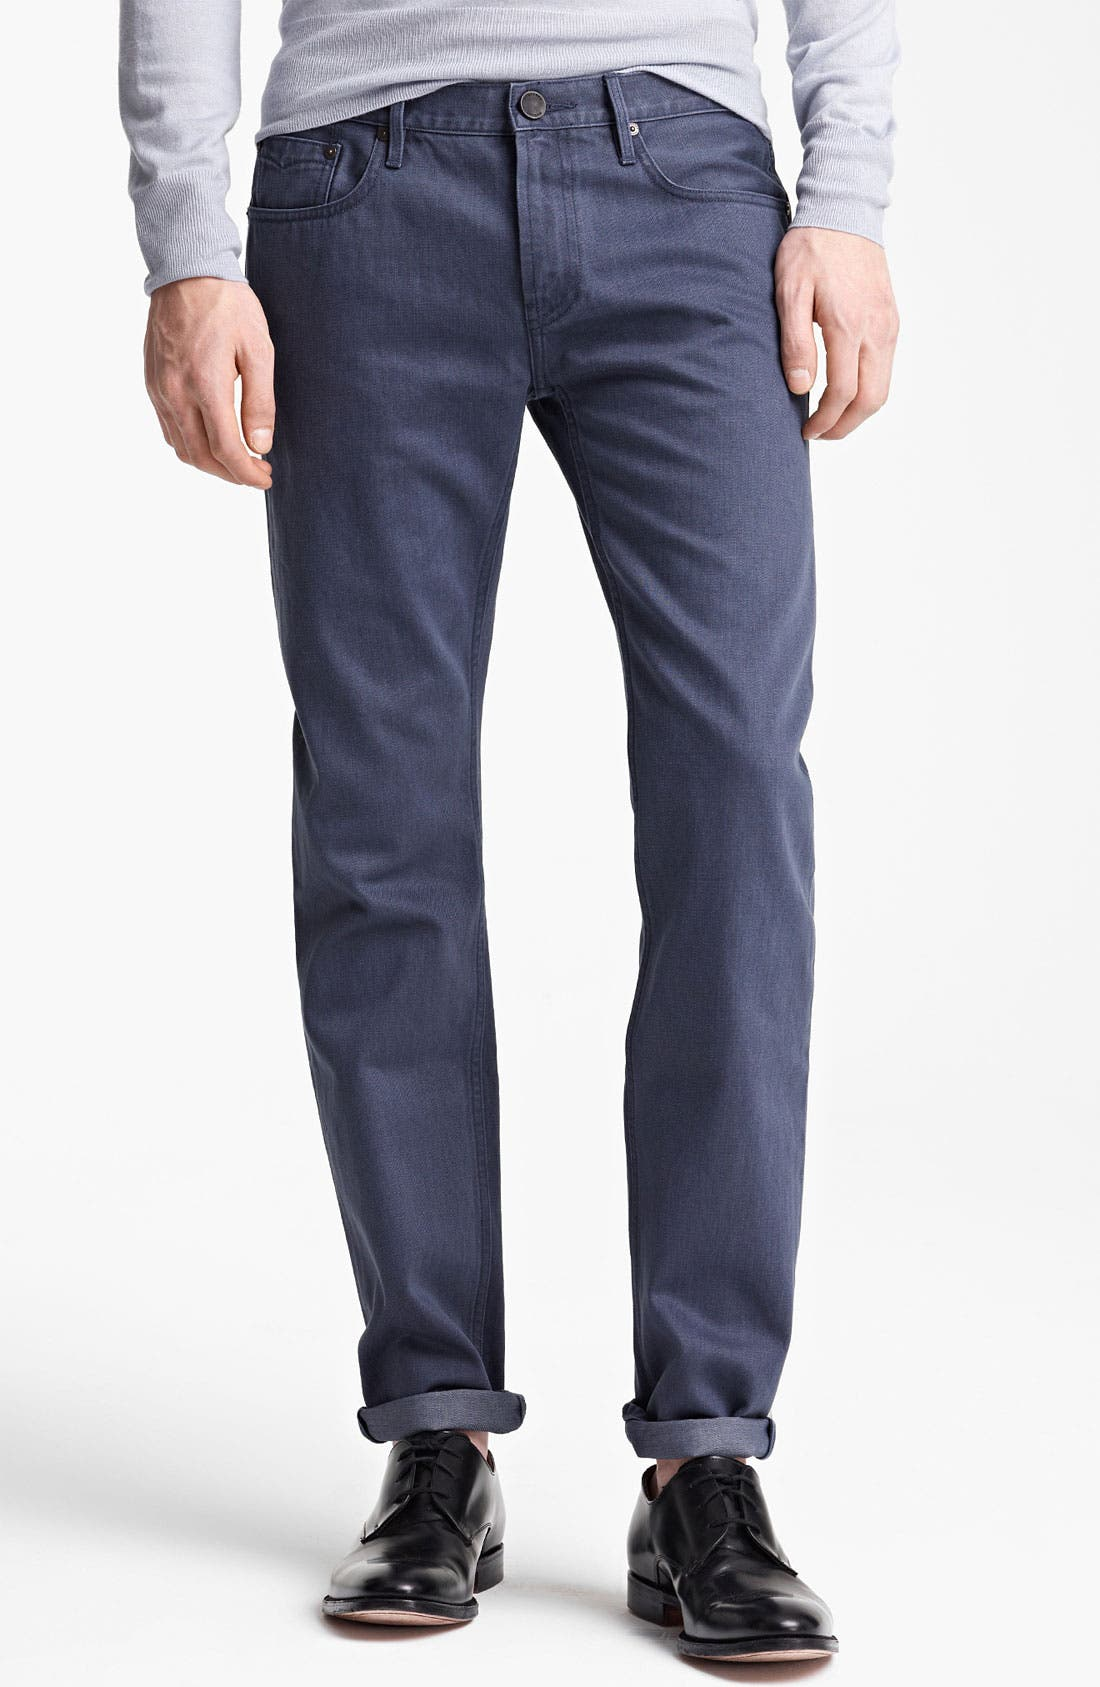 Alternate Image 1 Selected - Burberry London Straight Leg Jeans (Indigo)